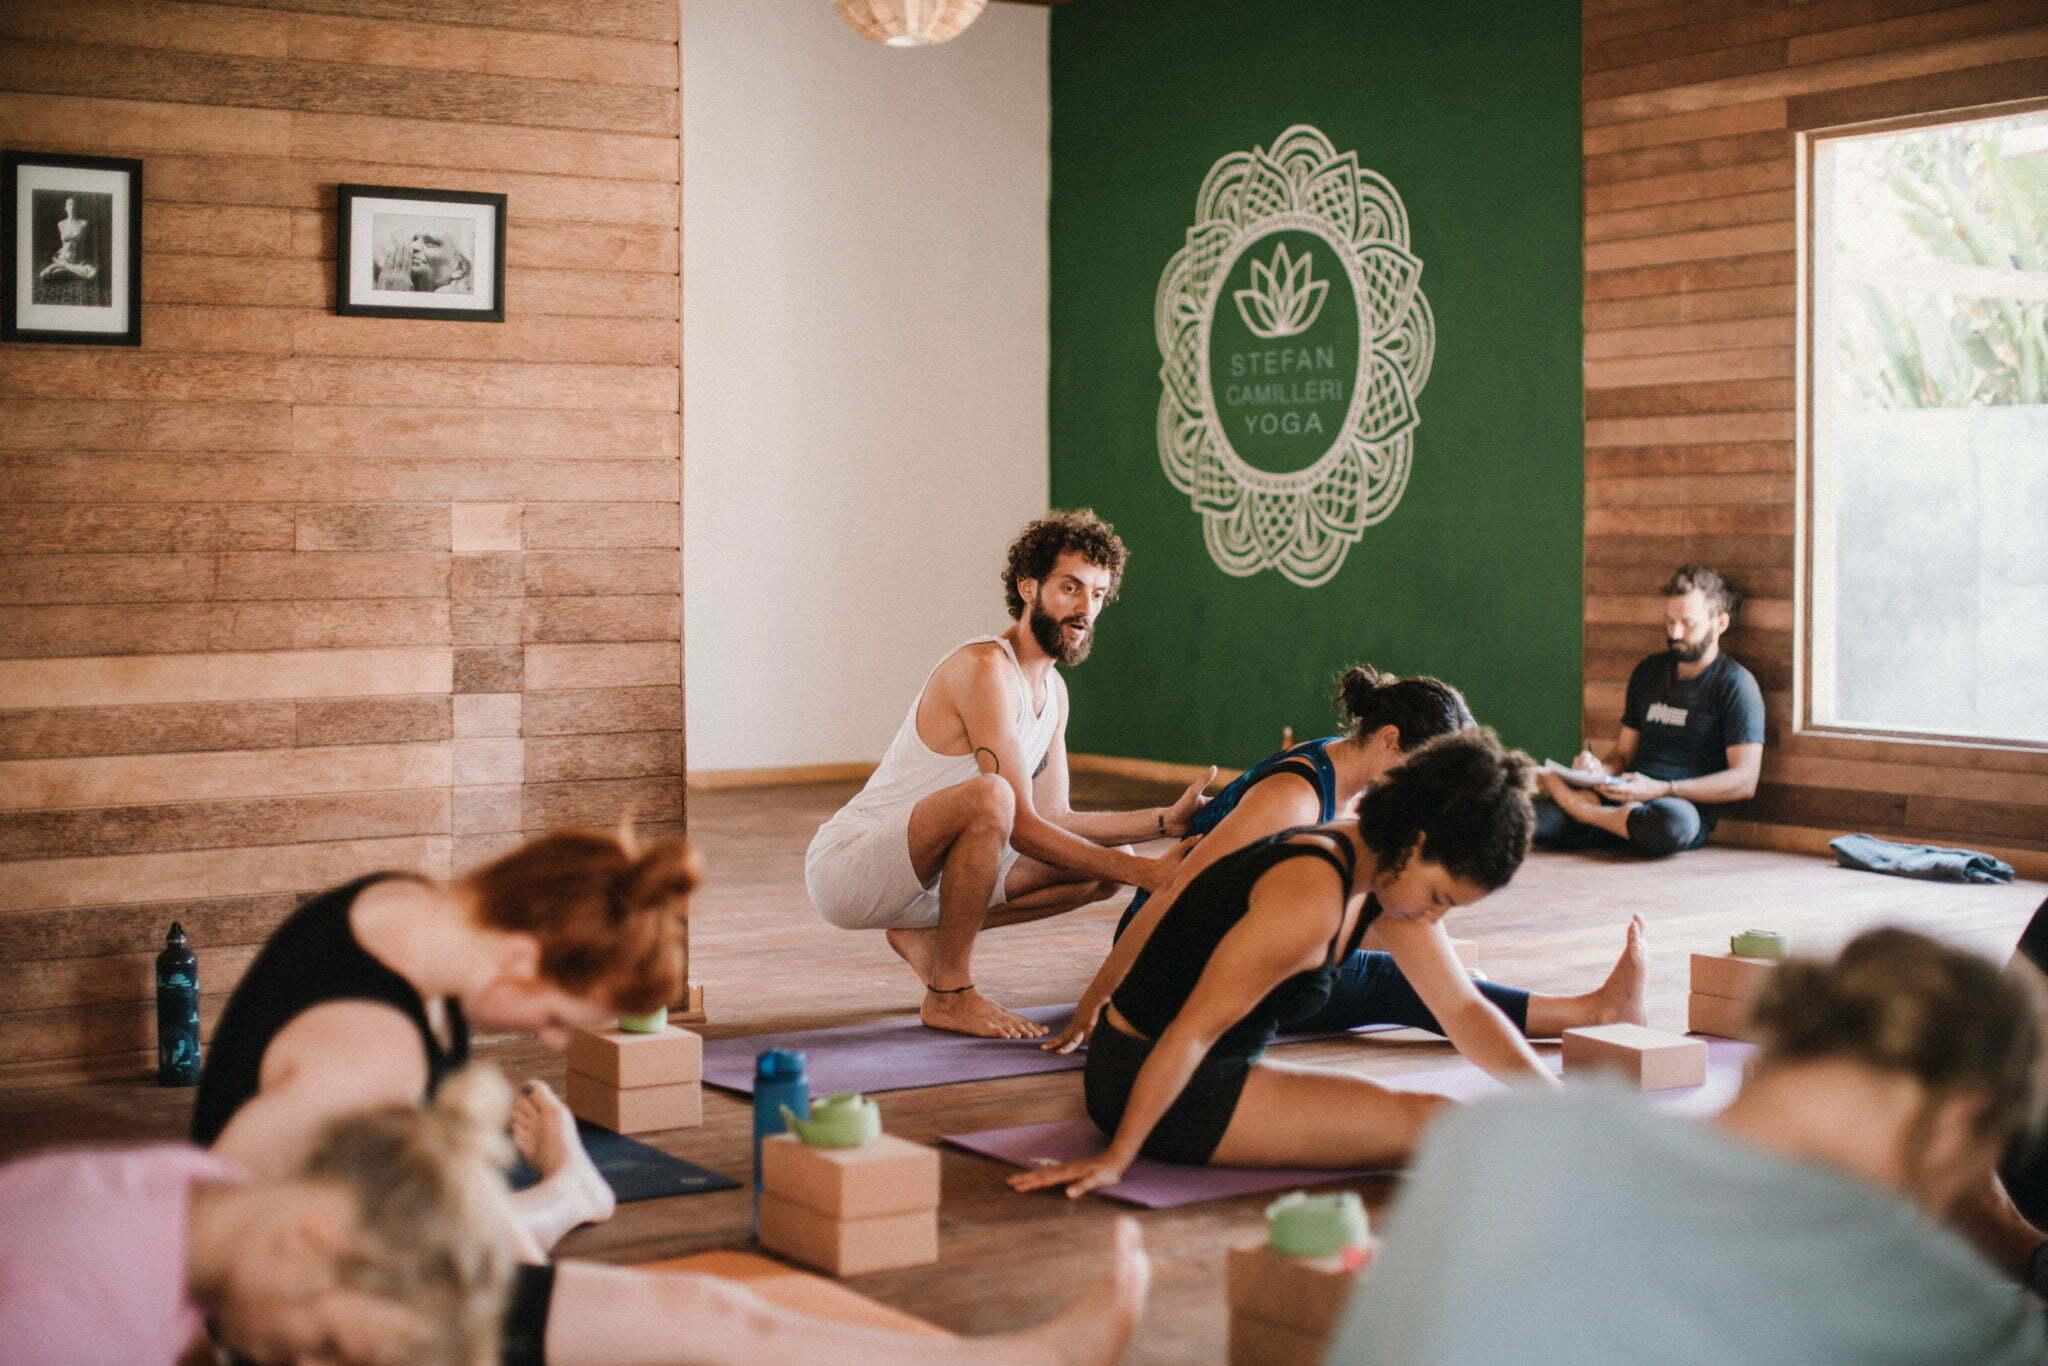 Stefan Camilleri Yoga-YTT-Lembangan 2018-Dean Raphael-78